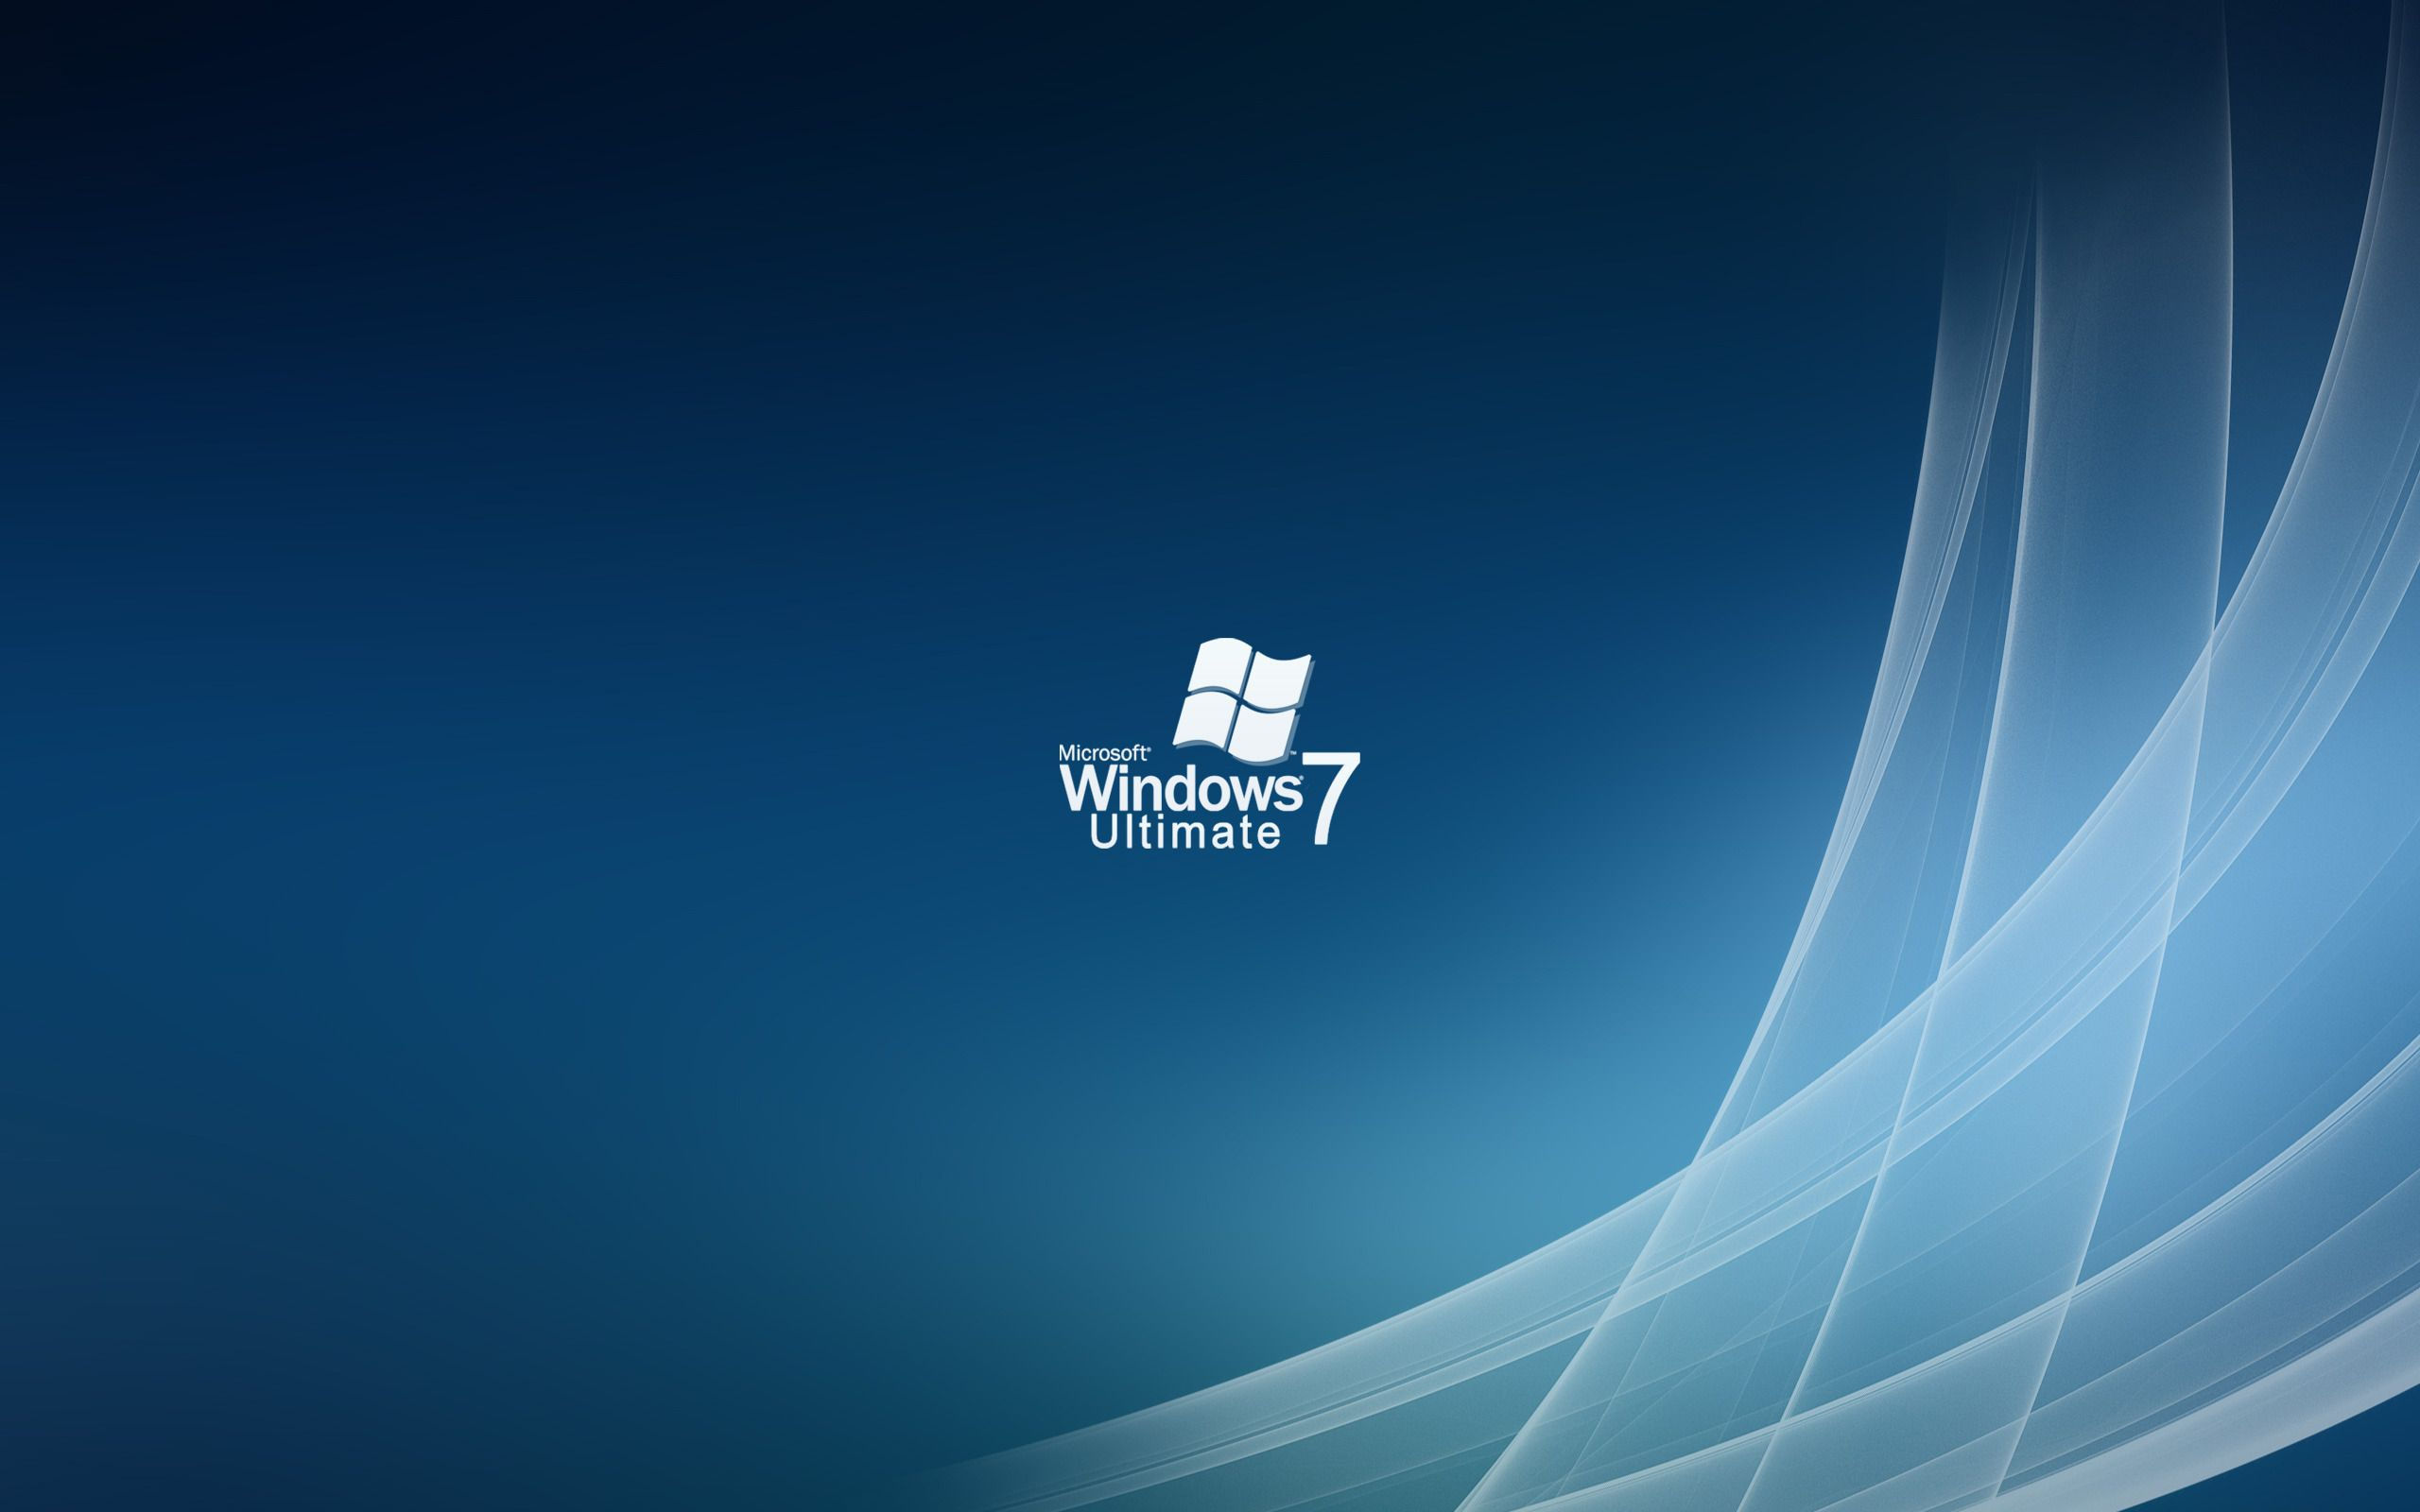 Windows 7 Desktop Wallpapers Top Free Windows 7 Desktop Backgrounds Wallpaperaccess